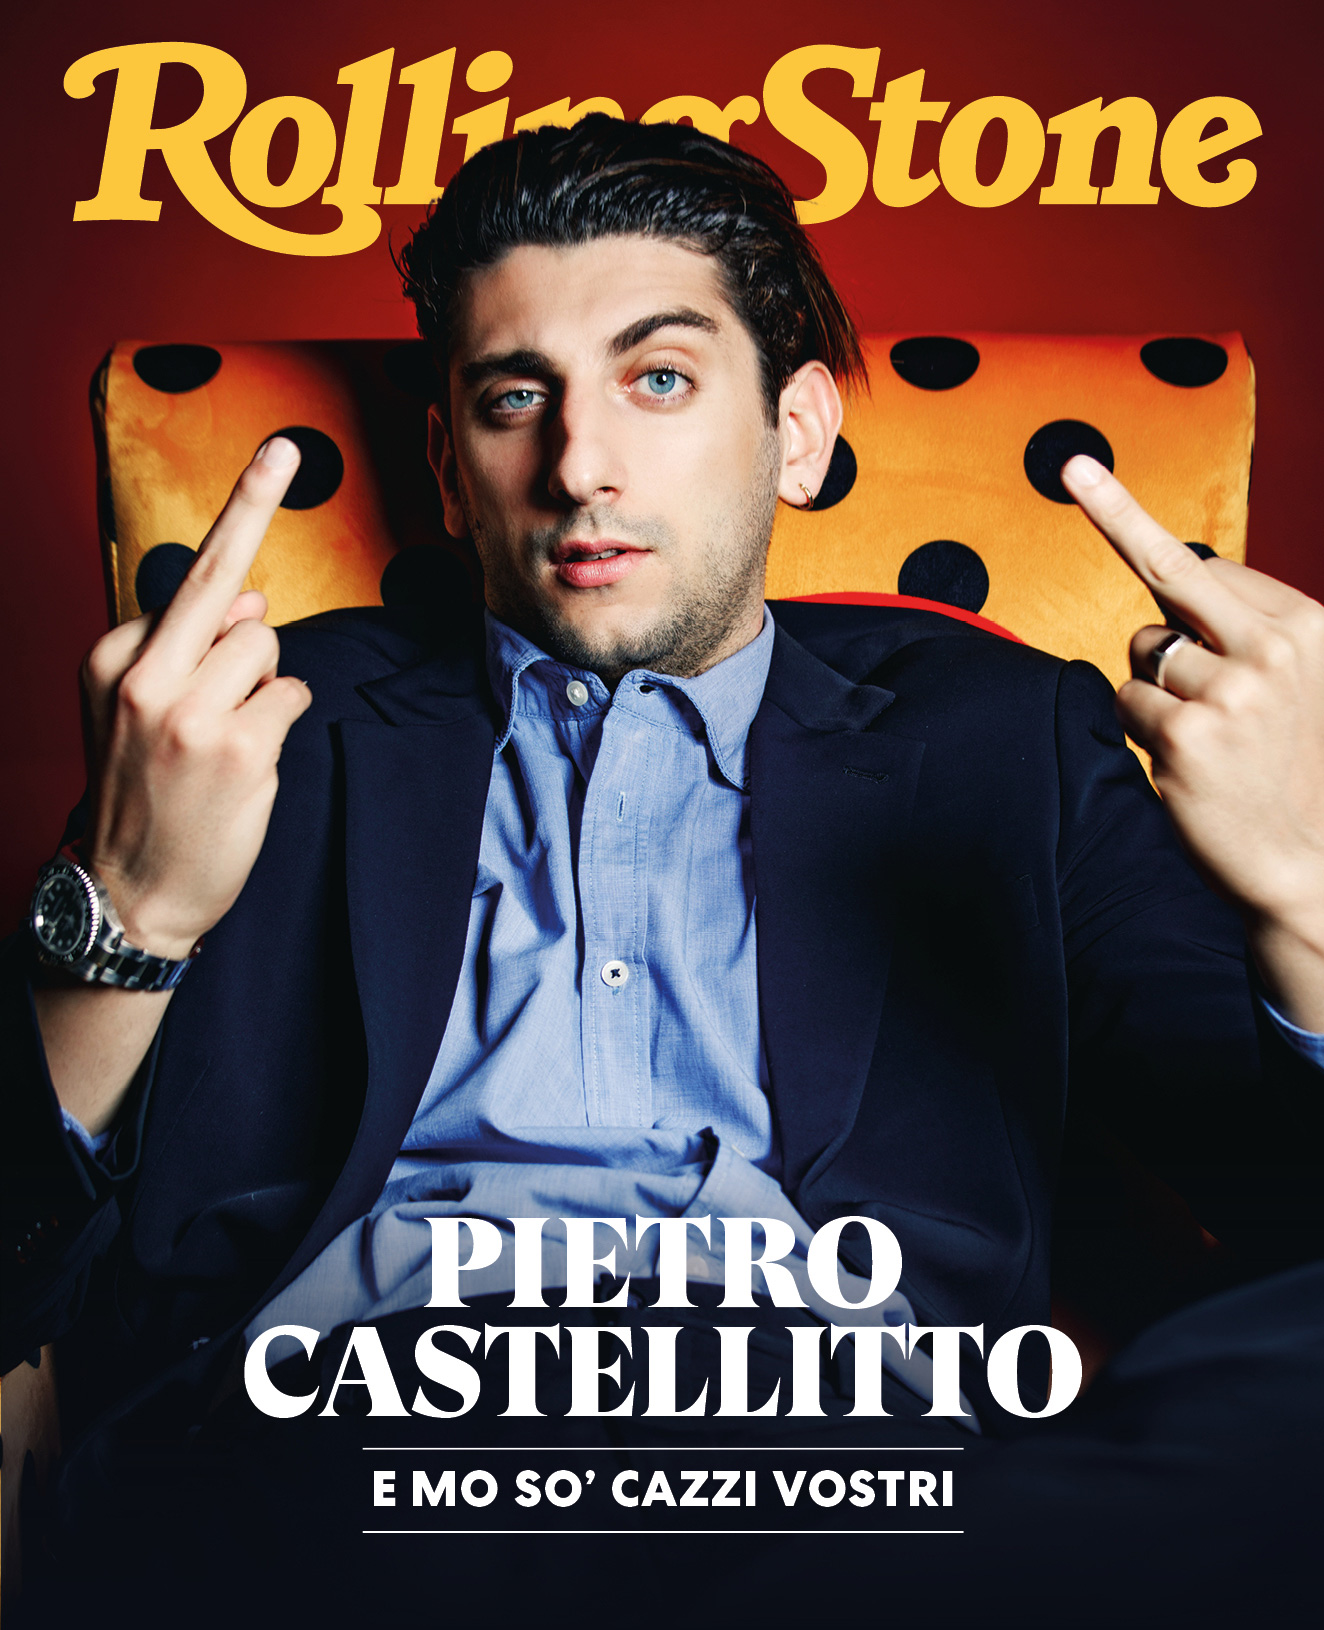 Pietro Castellitto digital cover Rolling Stone Italia